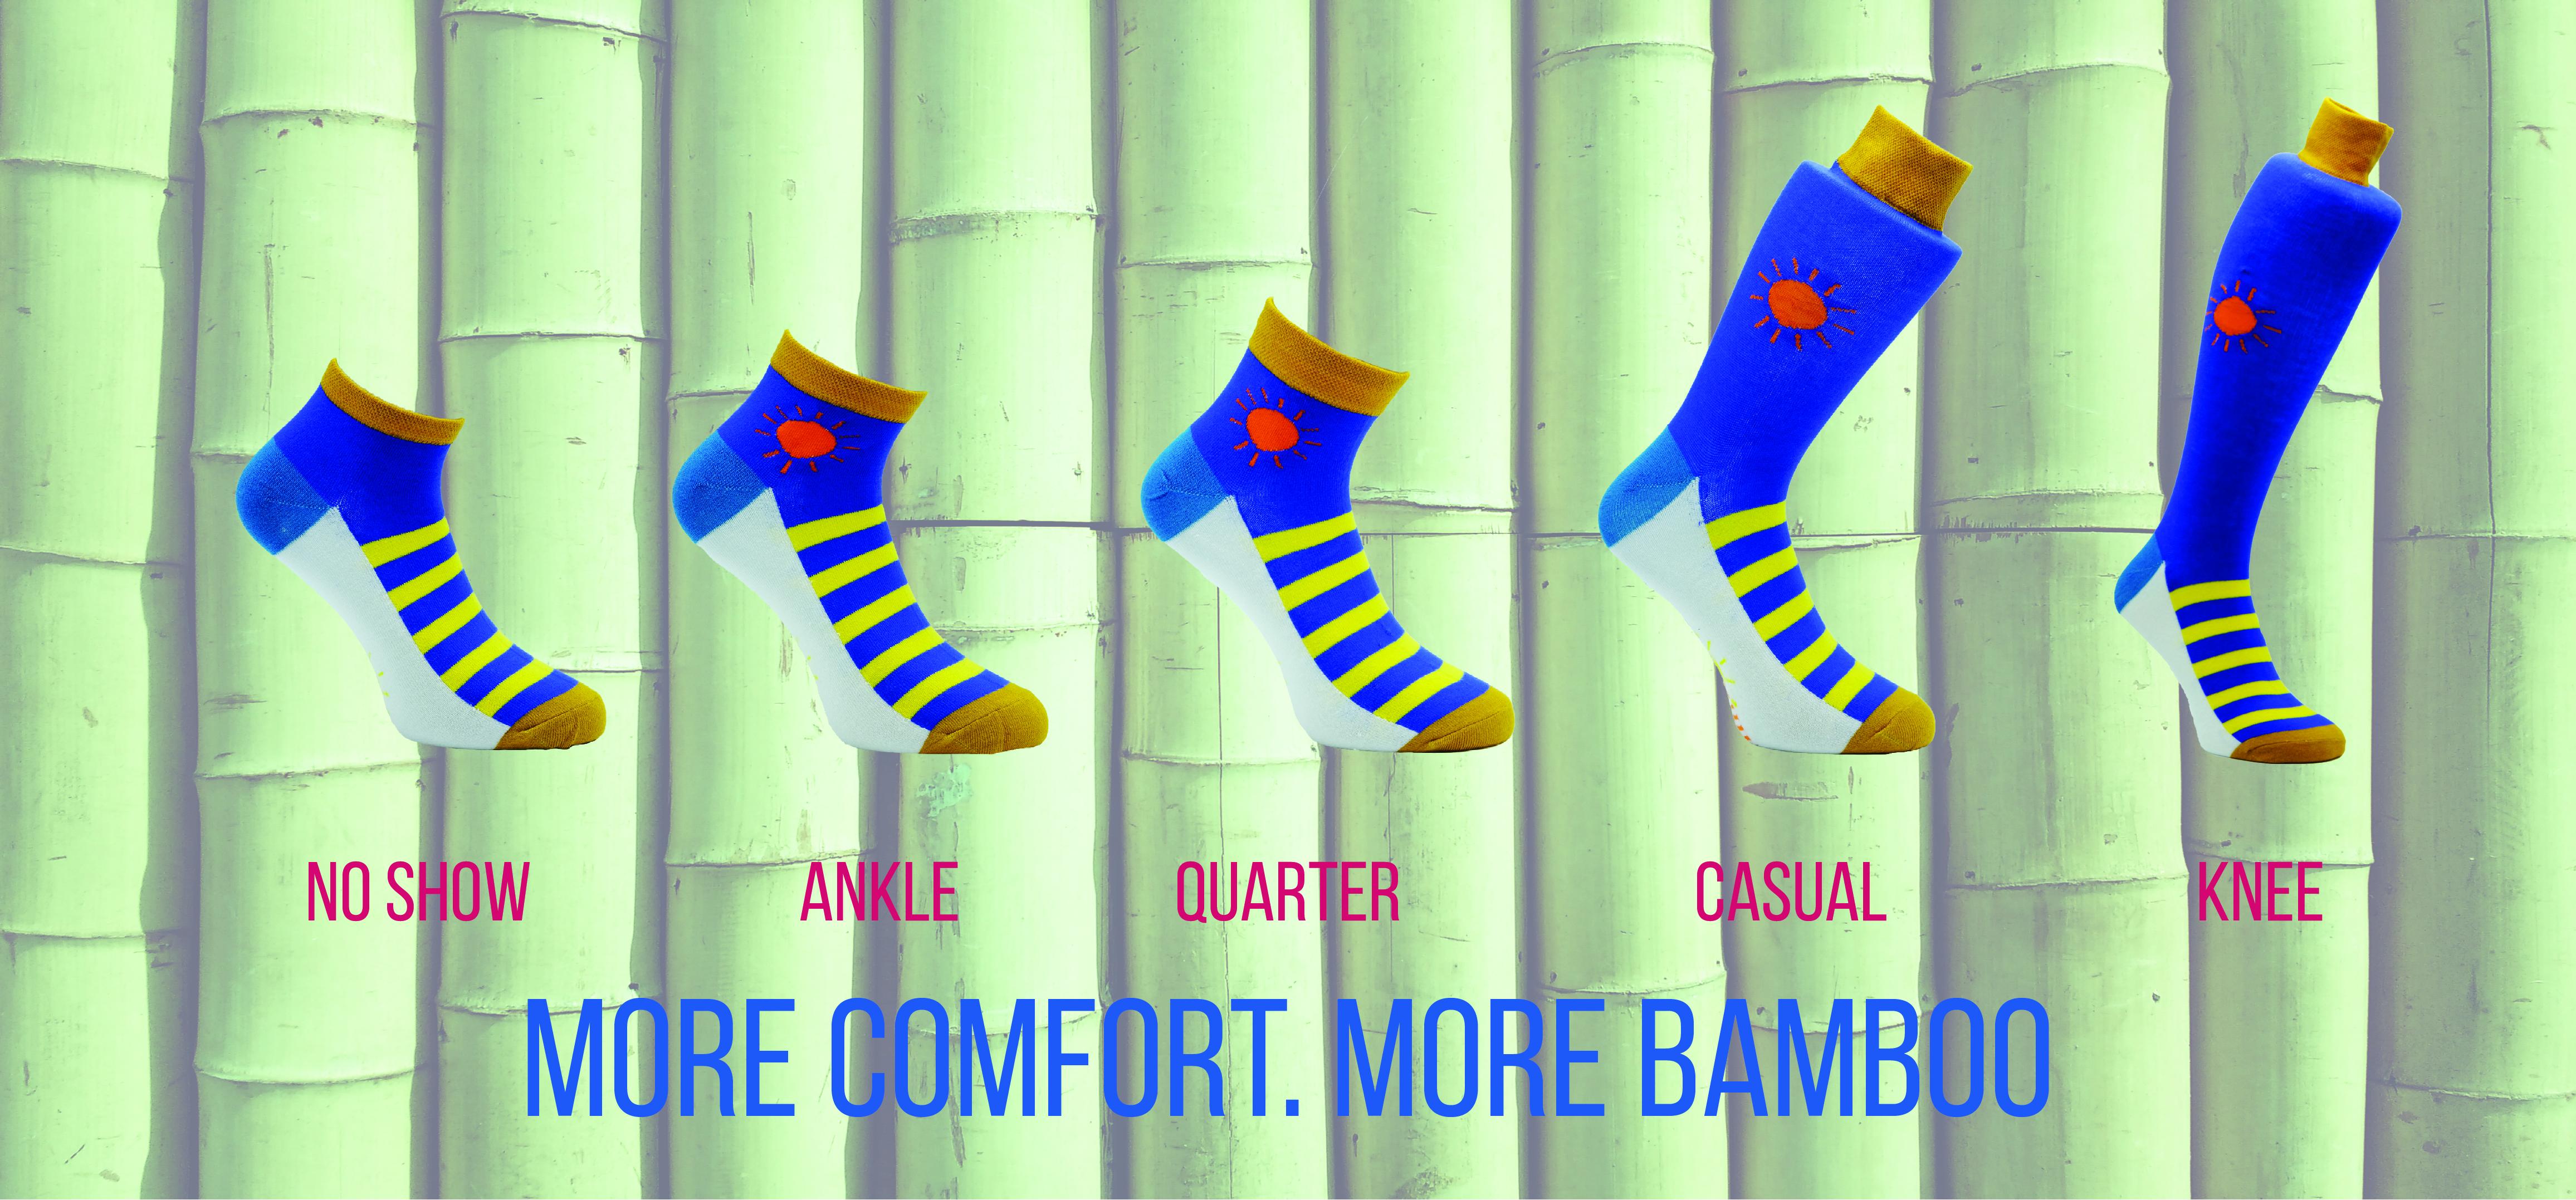 Custom made Bamboo socks